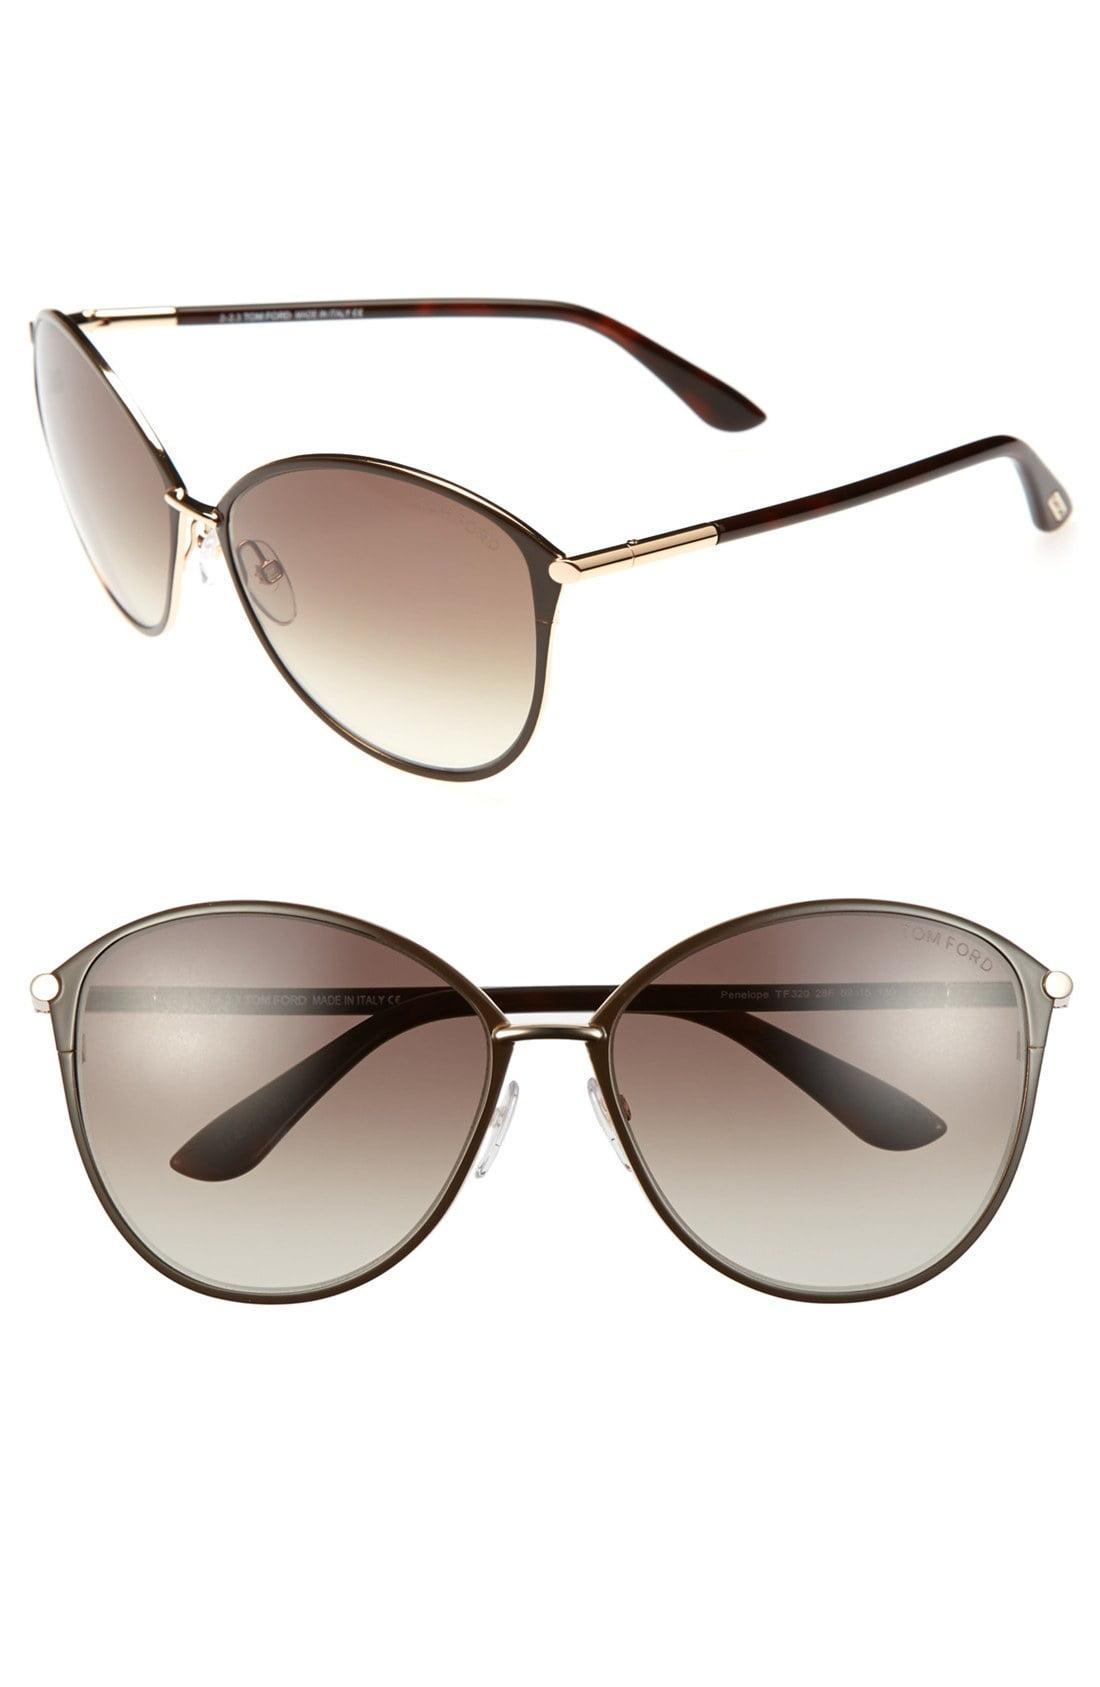 db260419b98 Lyst - Tom Ford Penelope 59mm Gradient Cat Eye Sunglasses - Shiny ...